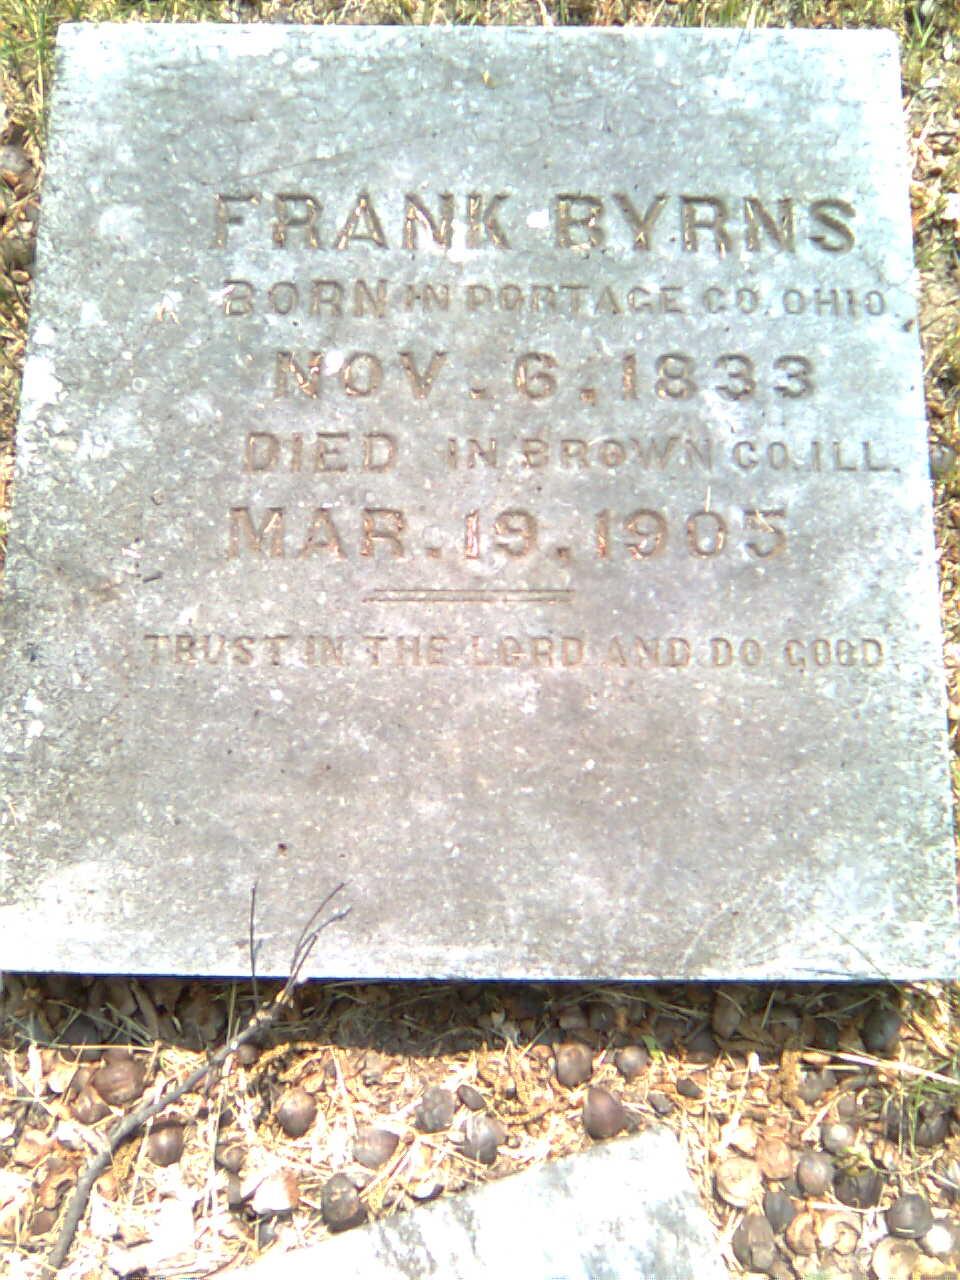 Frank Byrns